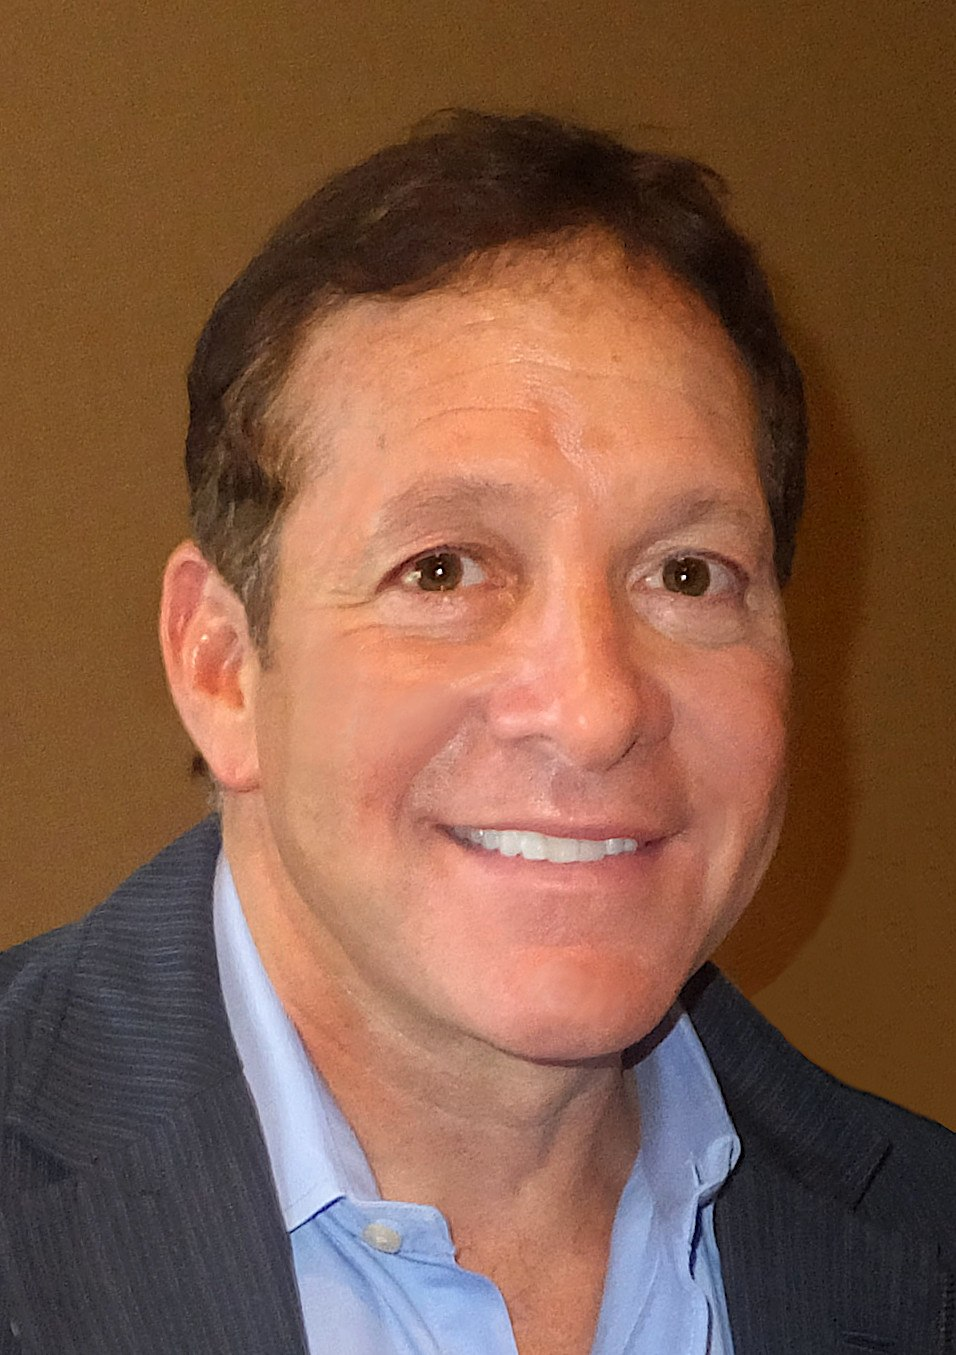 Steve Guttenberg 2013